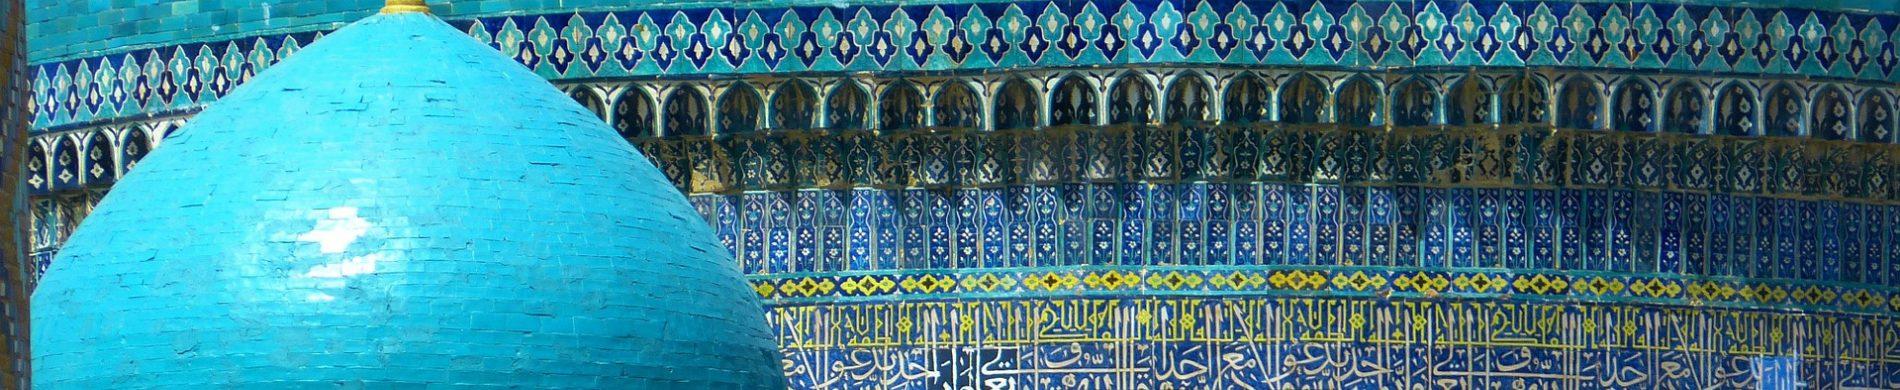 Ouzbékistan - Les Matins du Monde